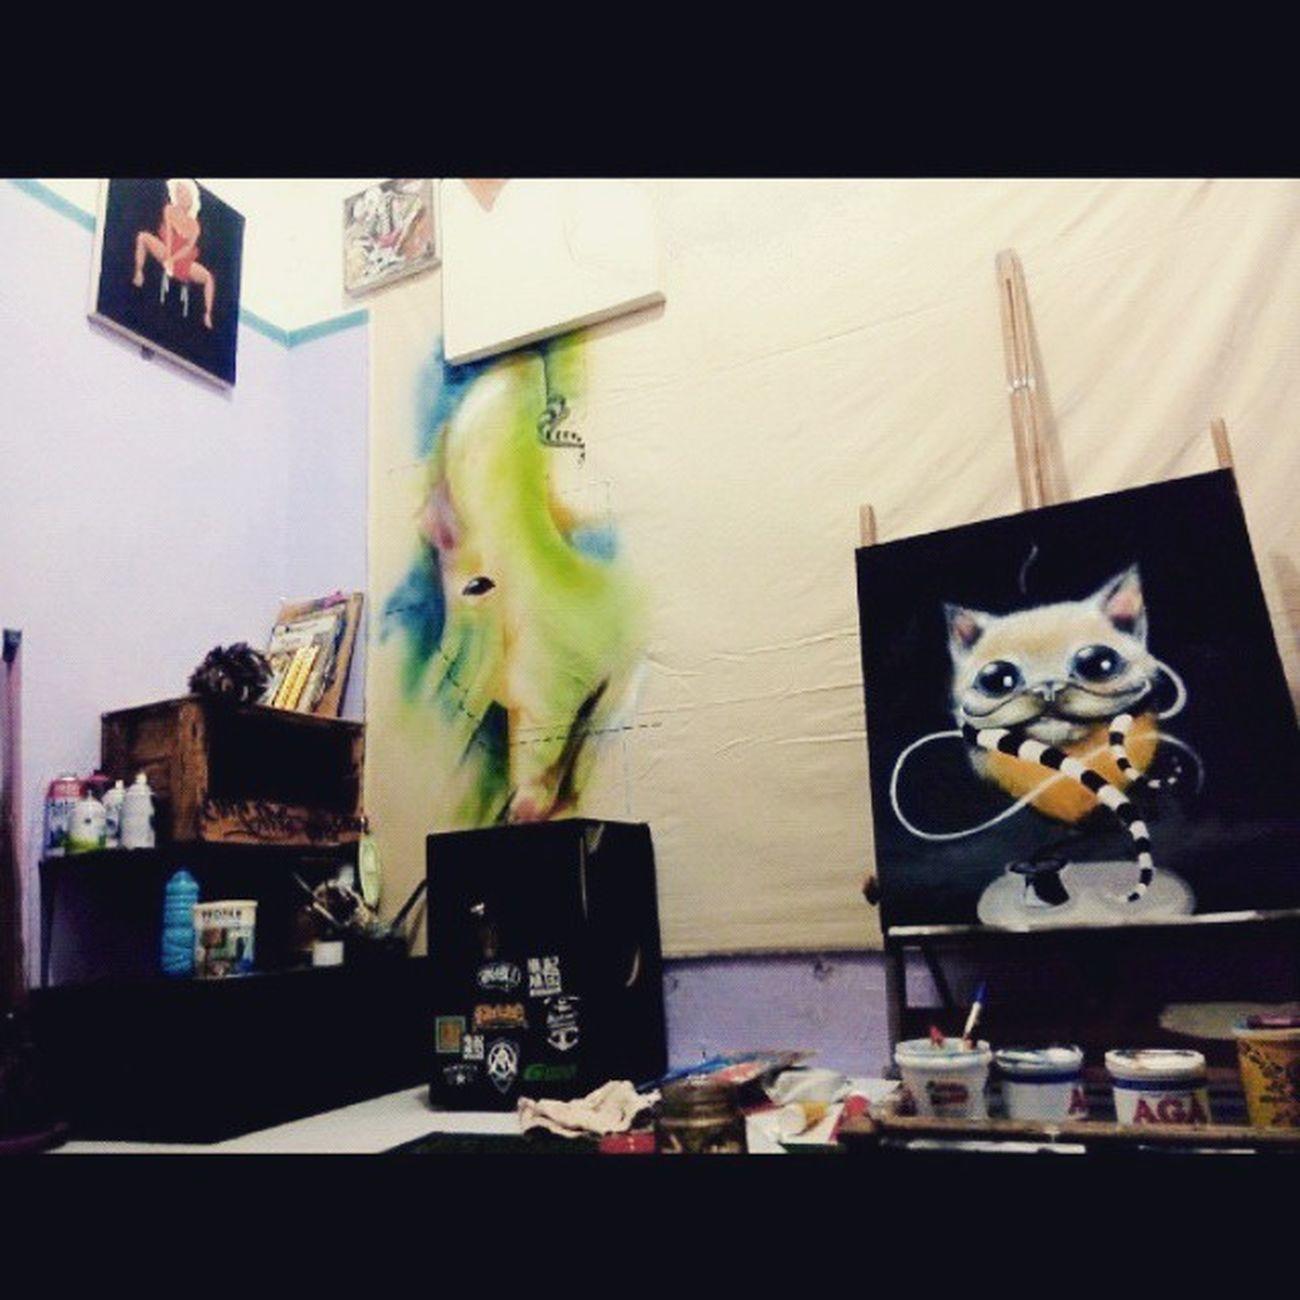 my artroom Artspace Room Painingroom Zhuwmoonstruck surabaya java indonesia serbukkayu